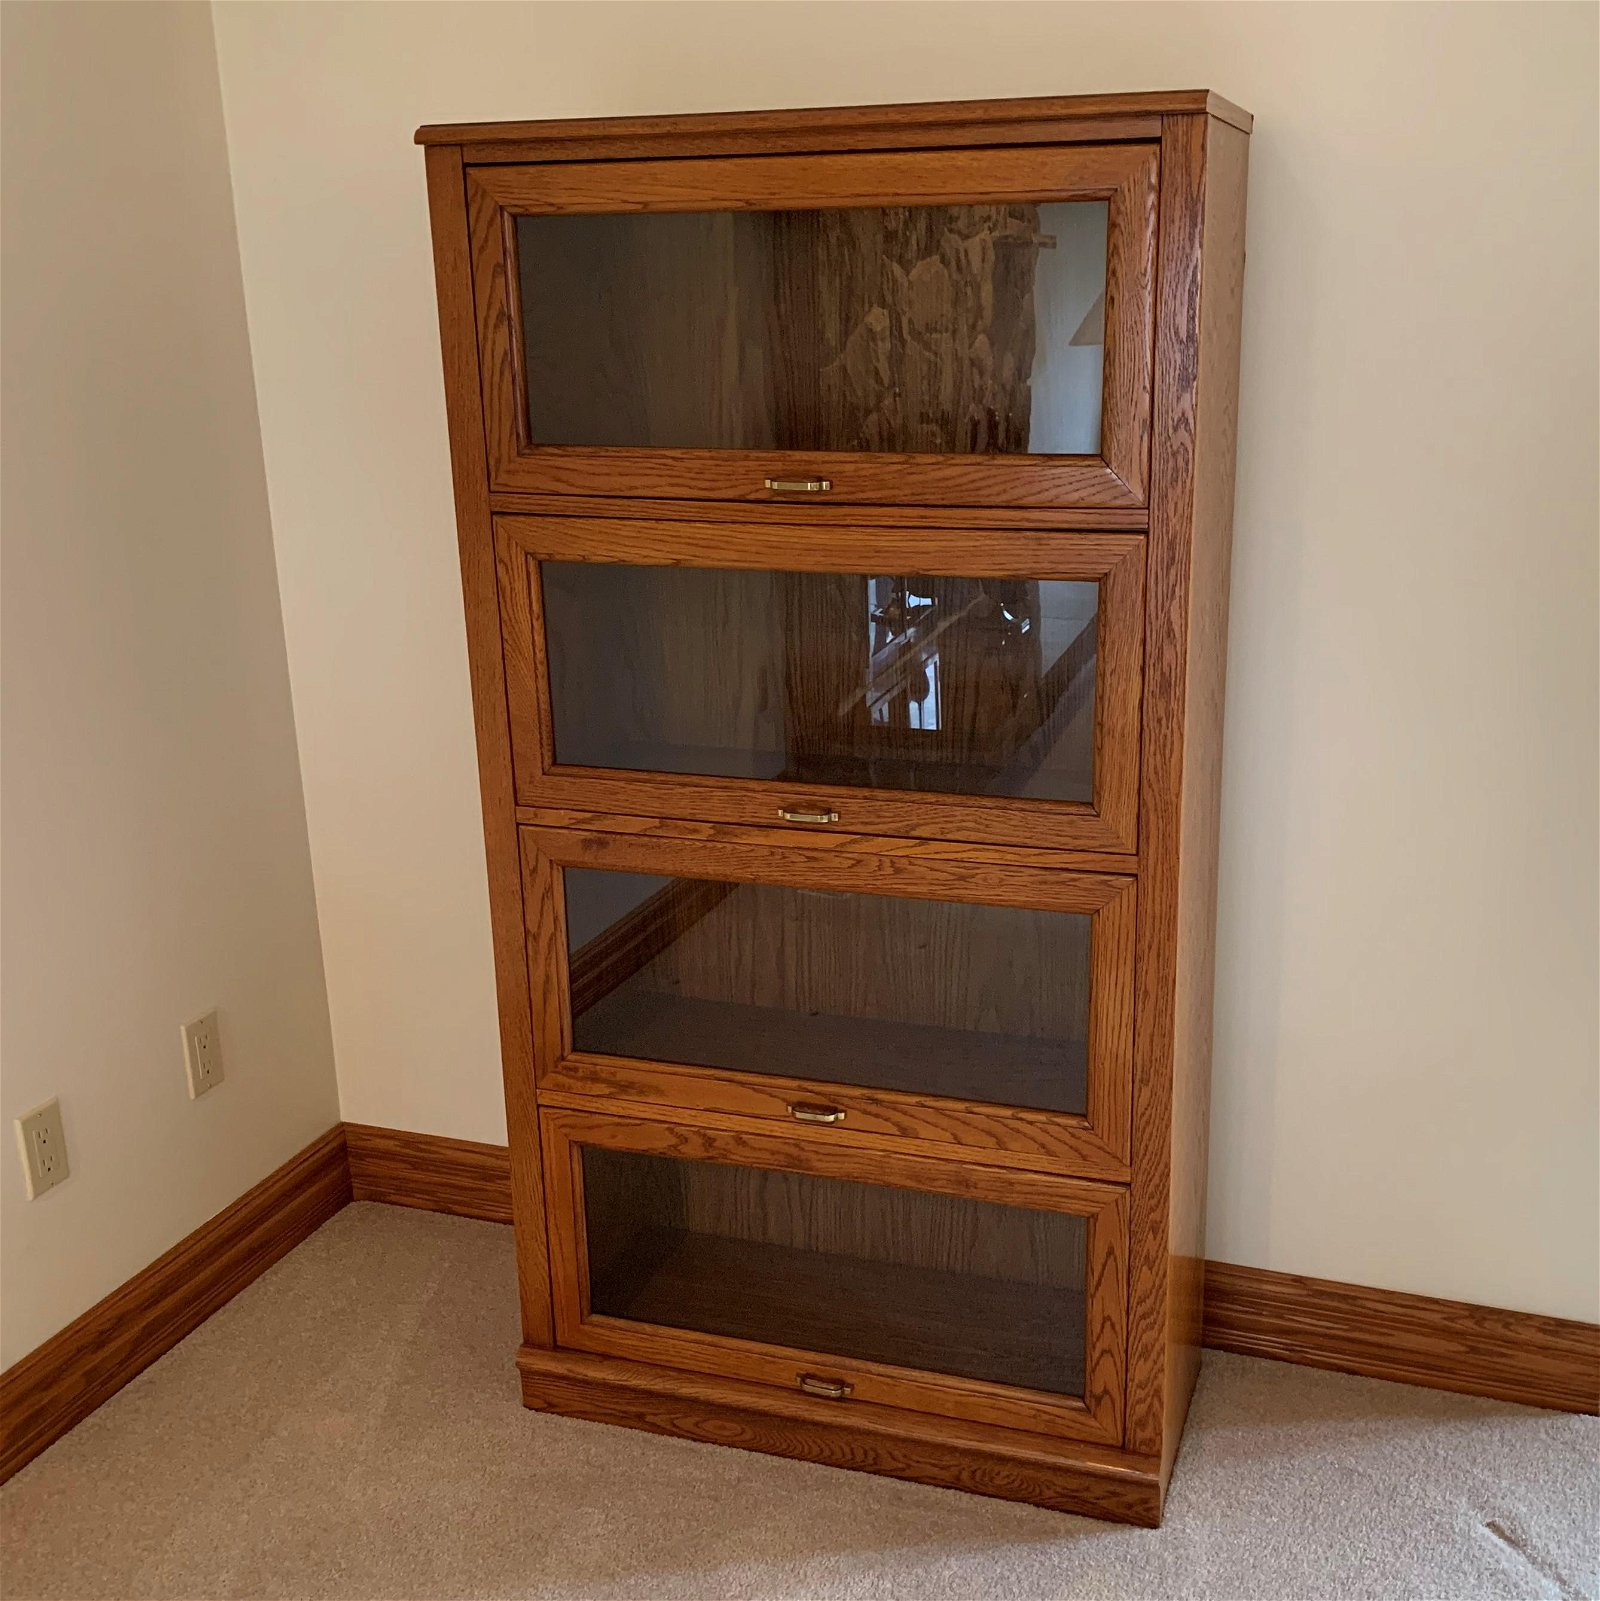 Wood Display Case w/ Glass Drawers